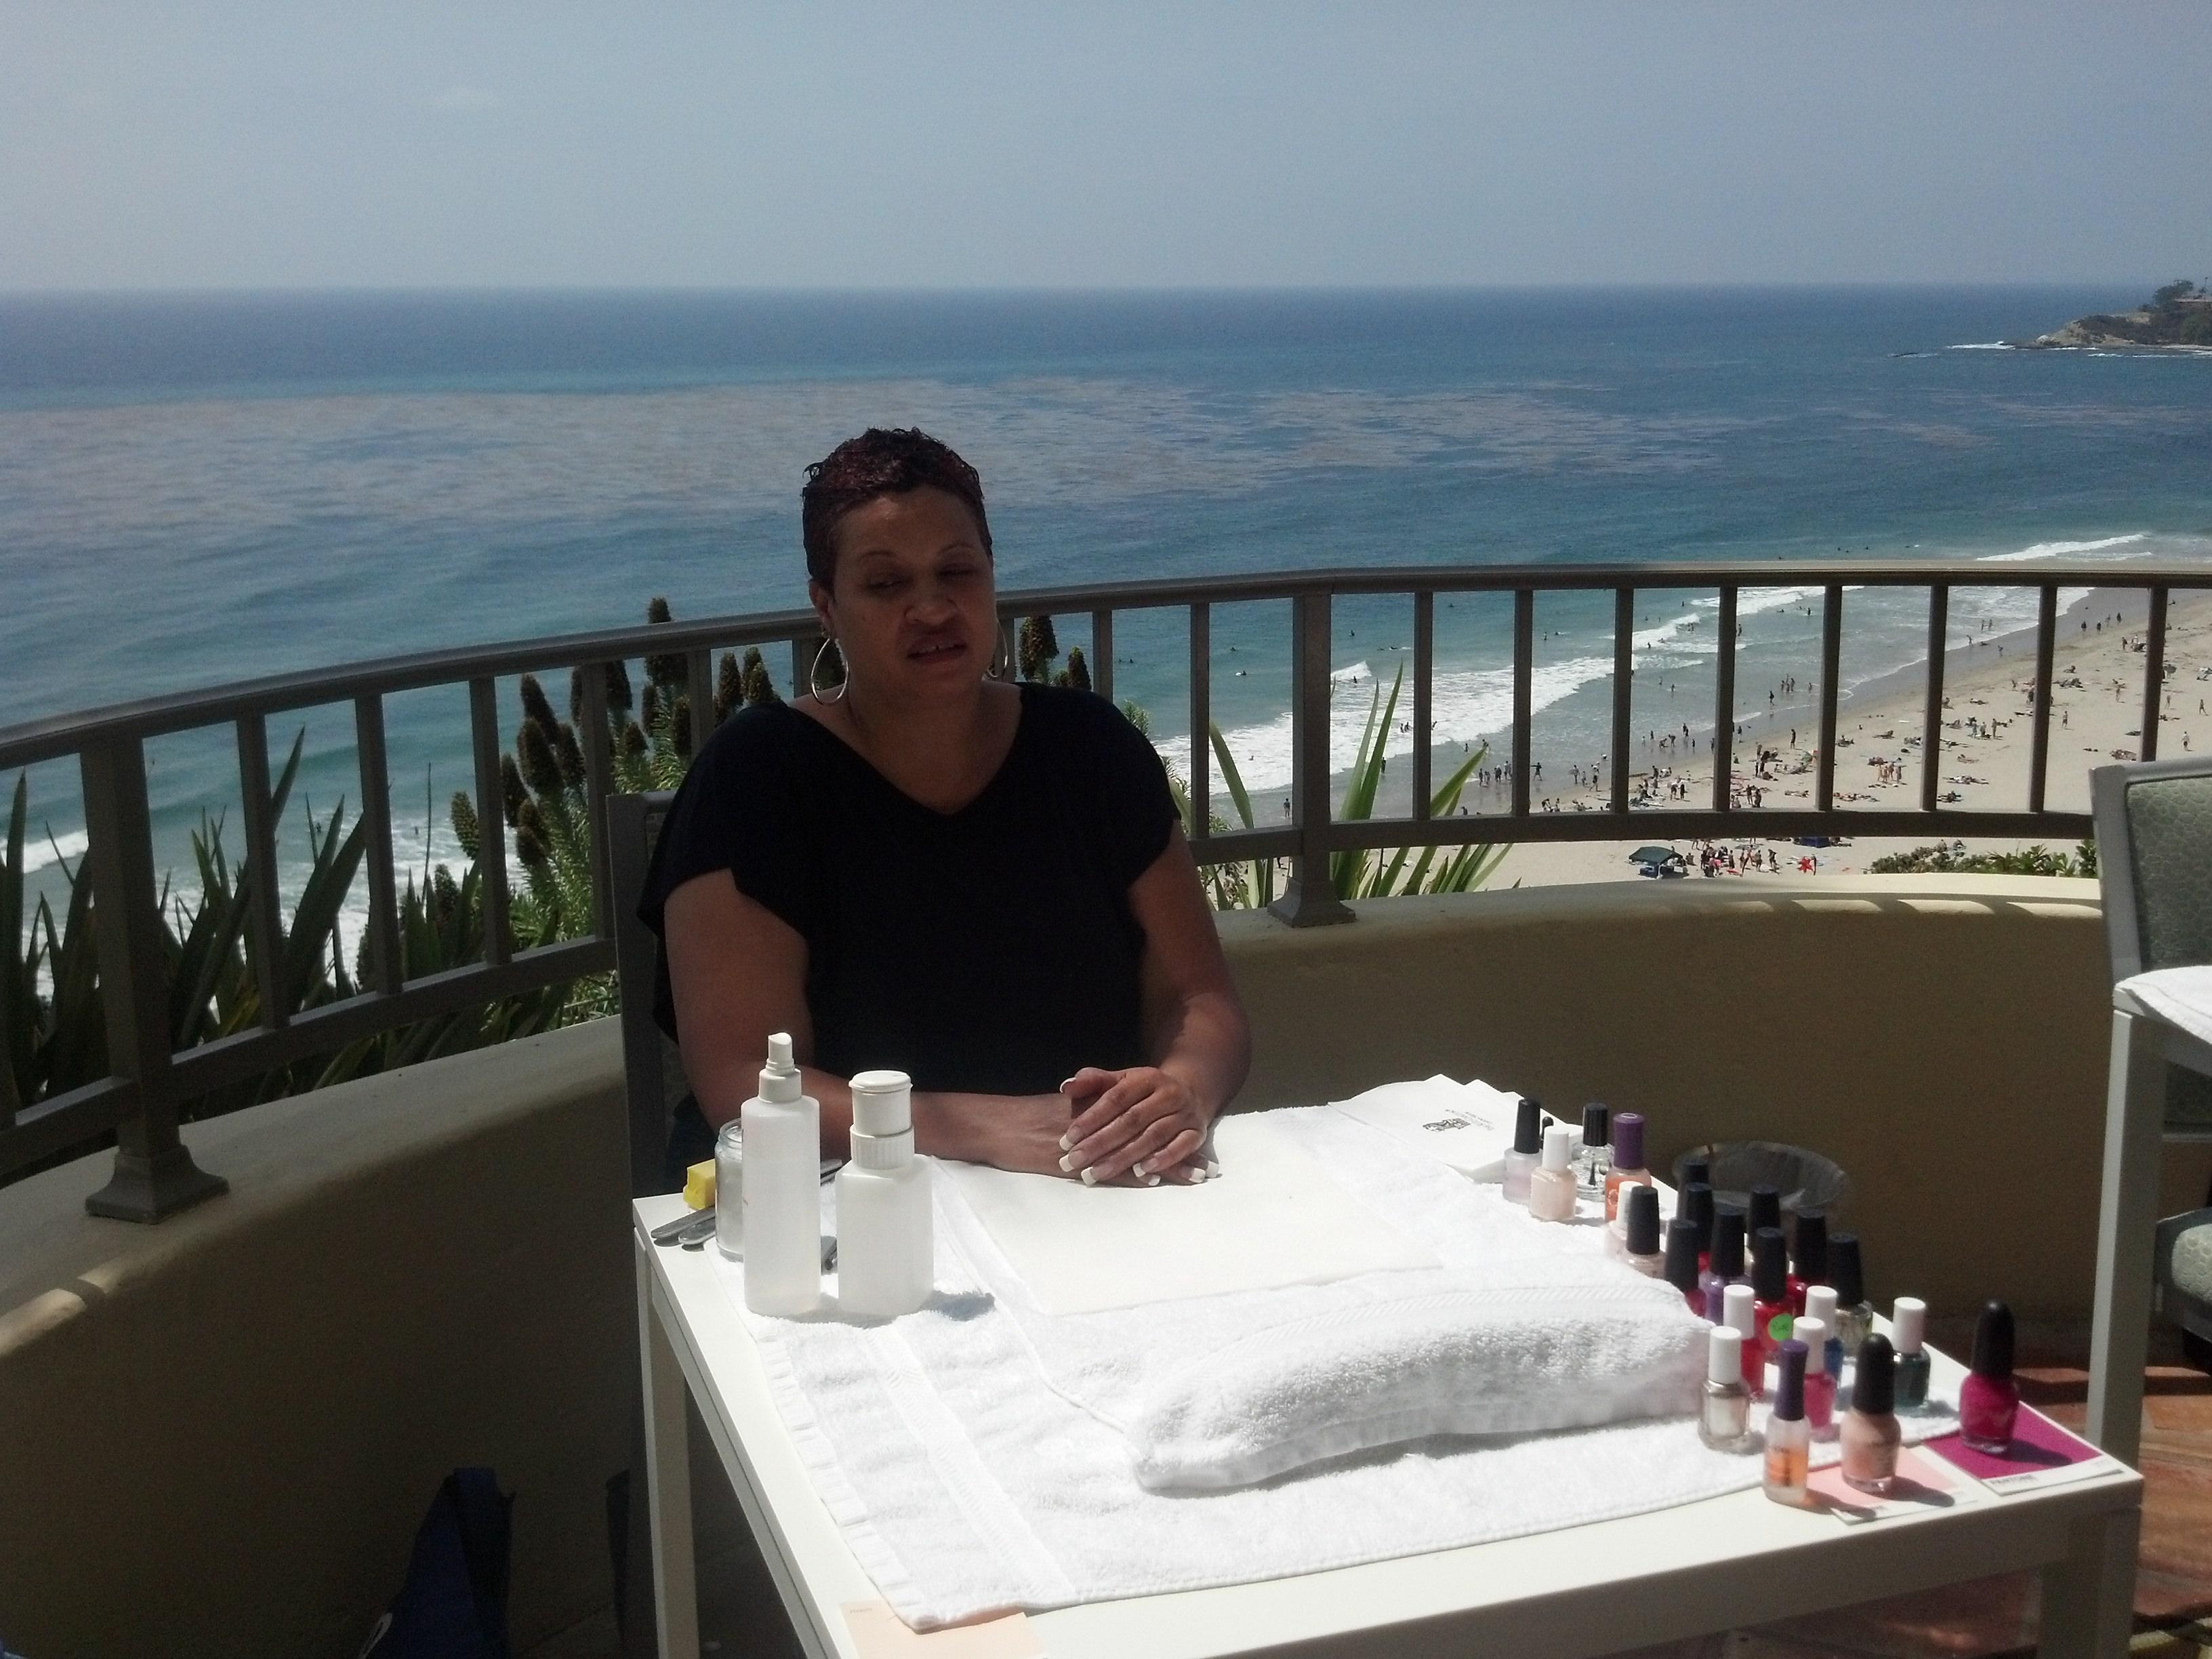 Mobile Nails - Mobile Massage Los Angeles 602-448-6836